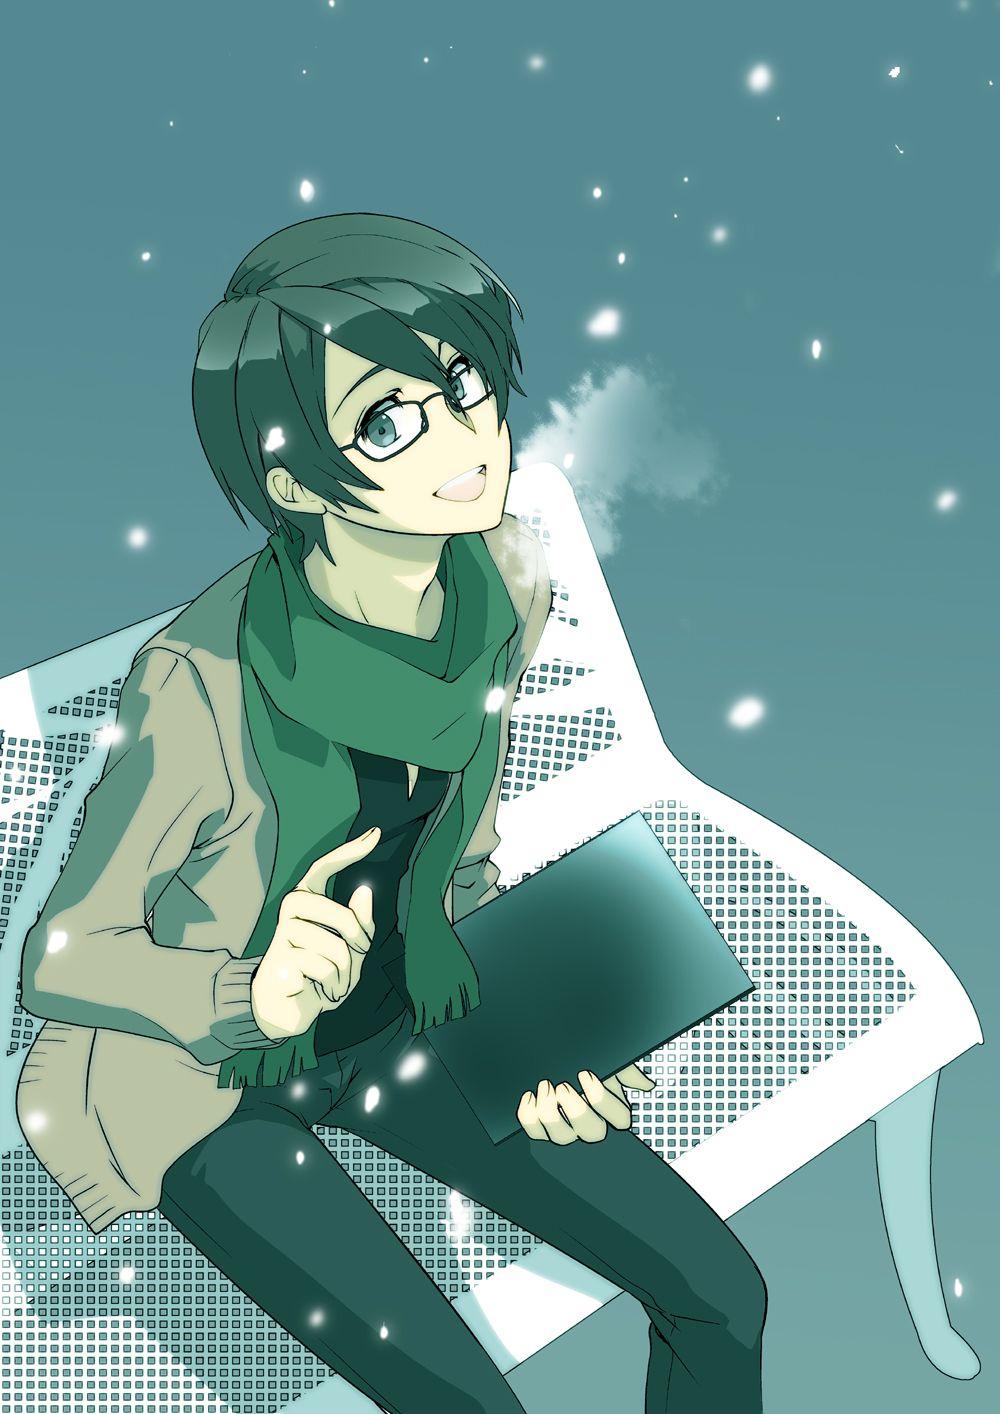 Kiyoteru Vocaloid funny, Vocaloid, Anime